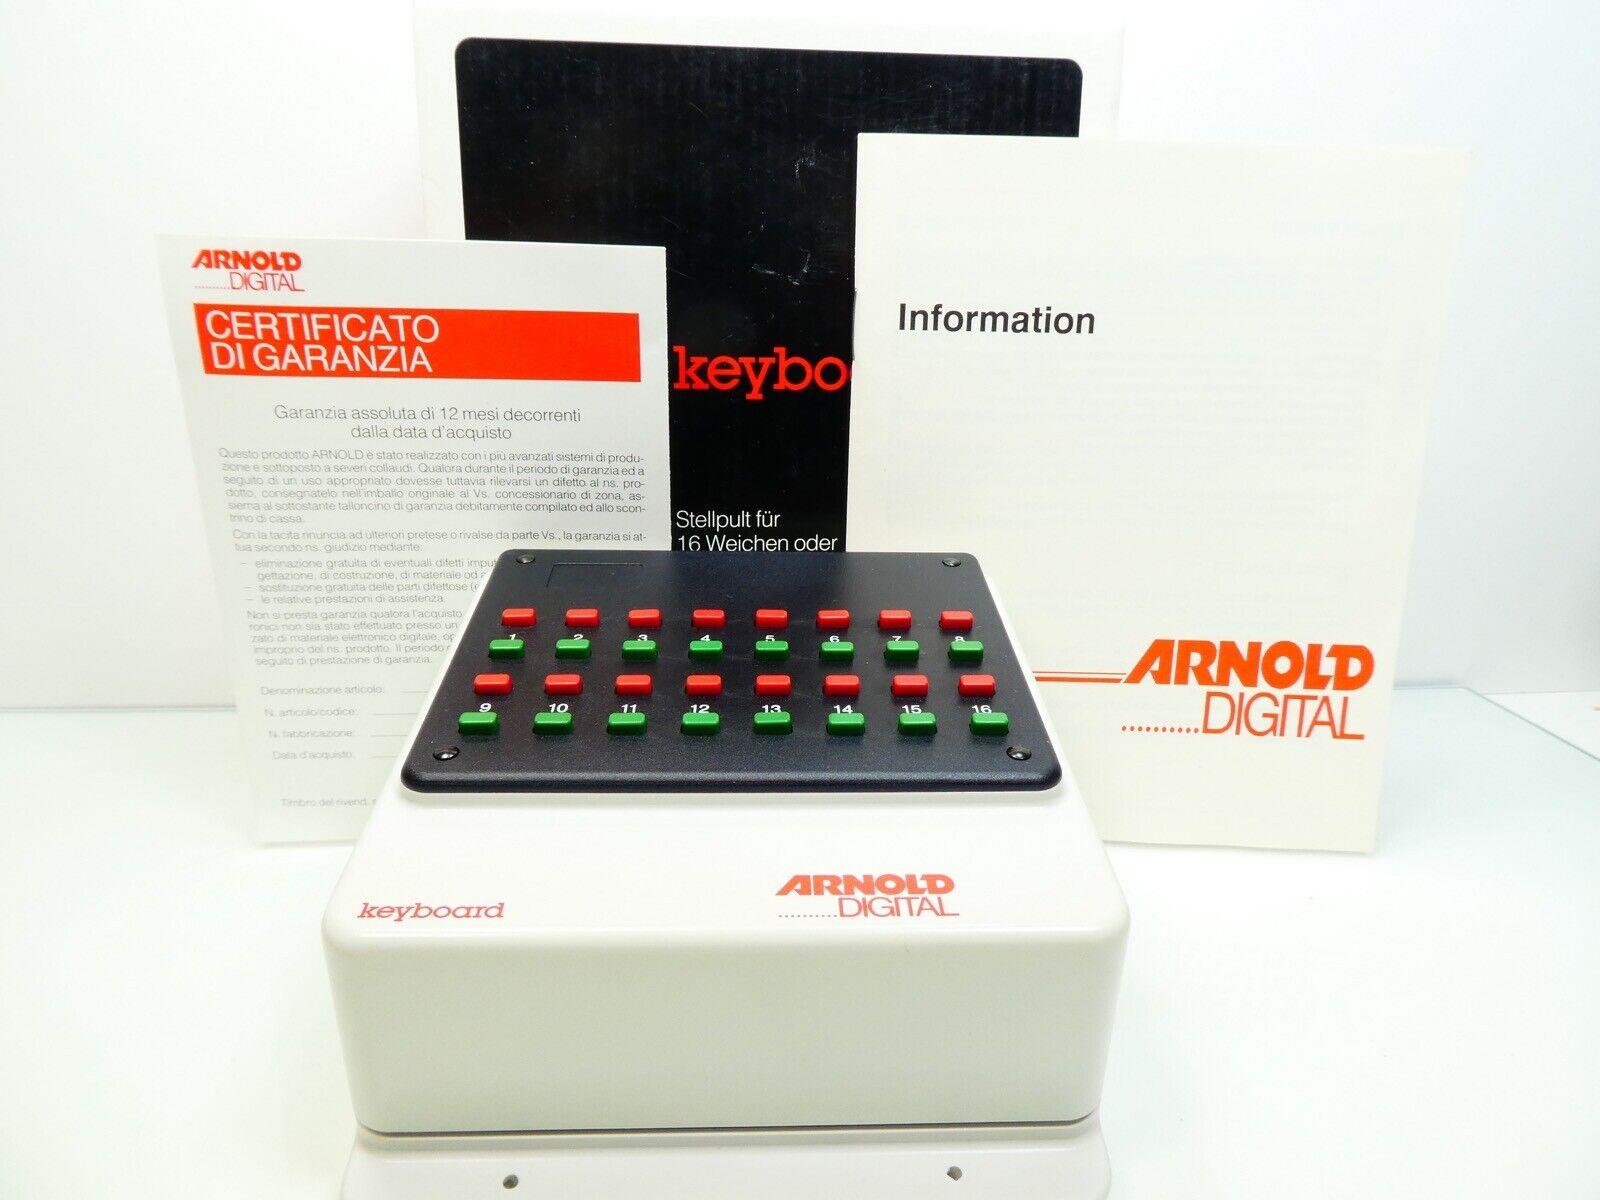 Arnold Digital 86040 - Keyboard - Baugleich Märklin 6040 - TOP in OVP -  8377